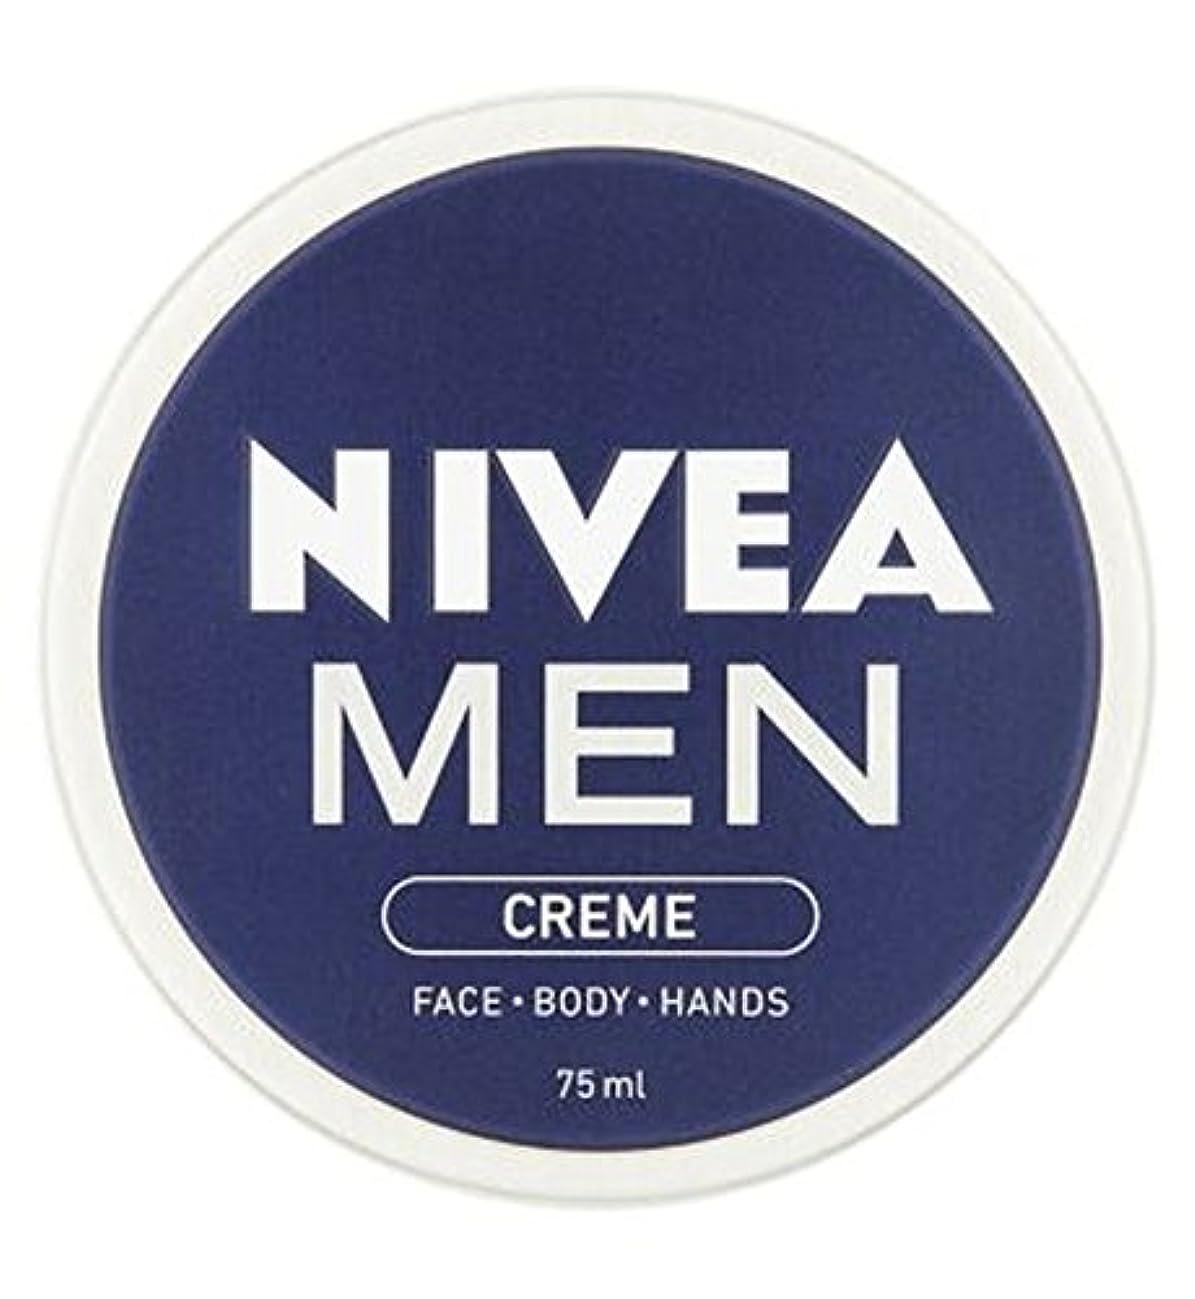 NIVEA MEN Creme 75ml - ニベアの男性は75ミリリットルをクリーム (Nivea) [並行輸入品]